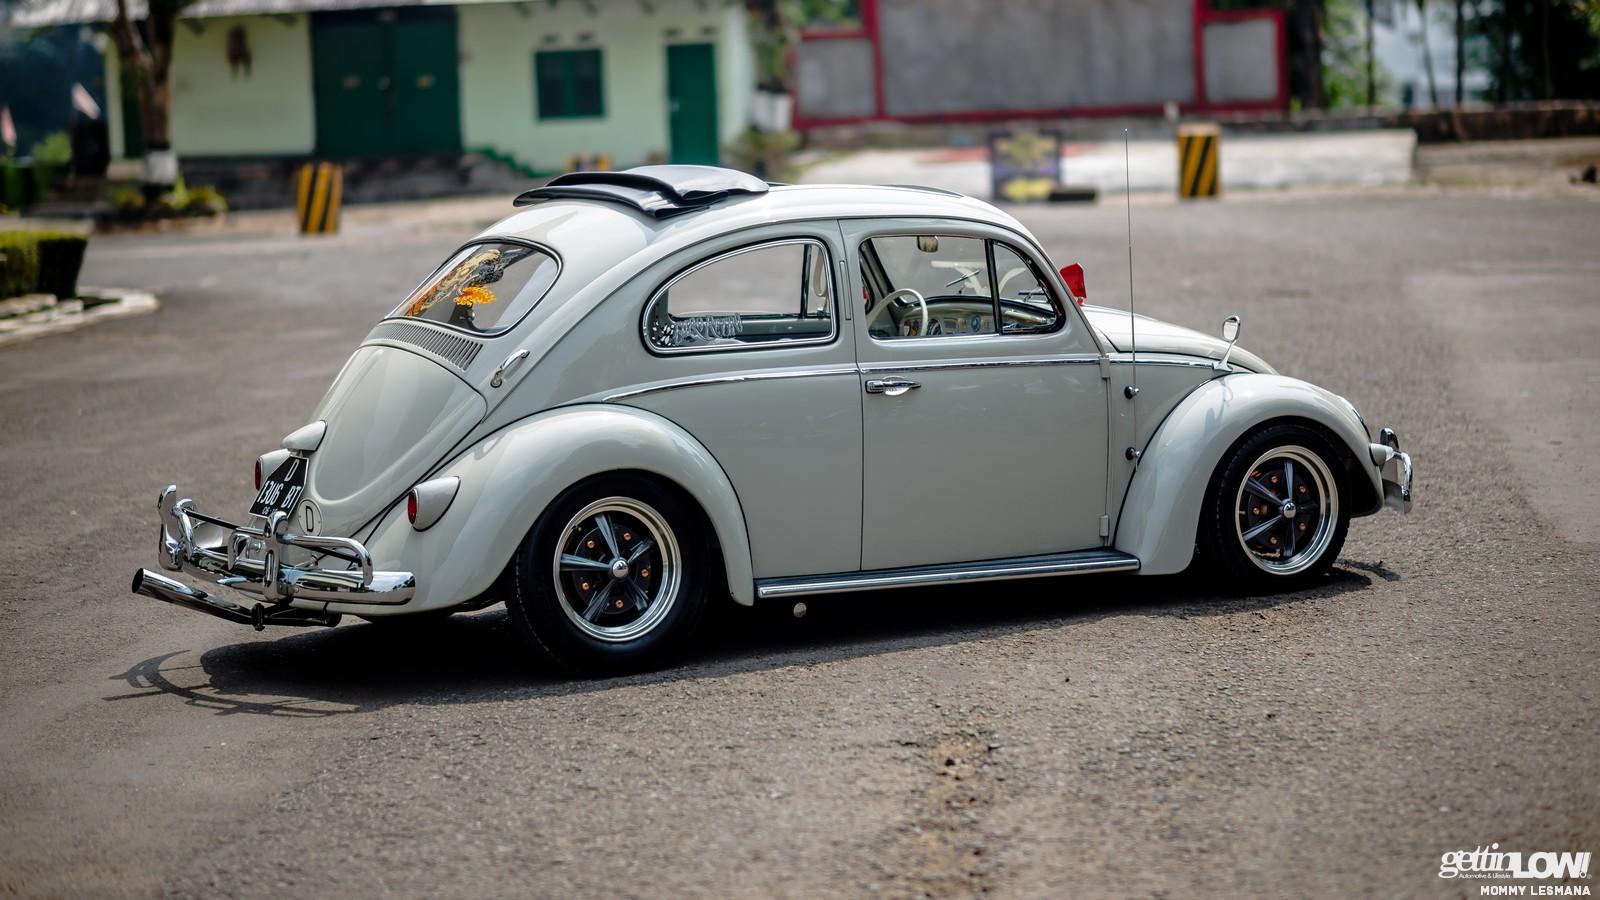 Patranegara-Beetle 1959